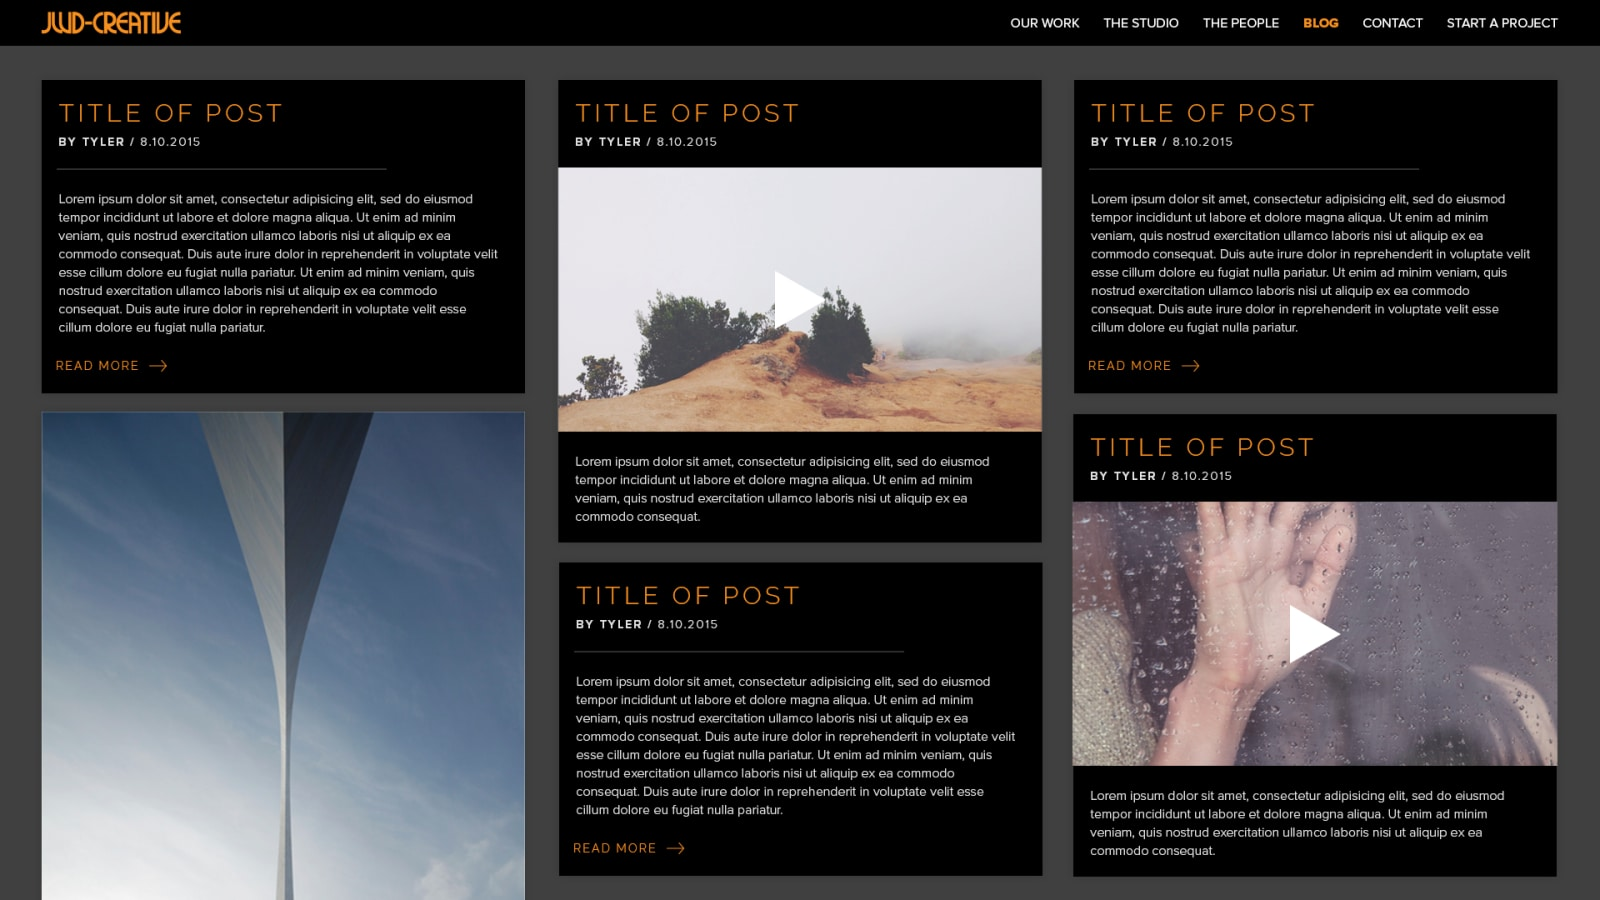 JWD Creative Blog